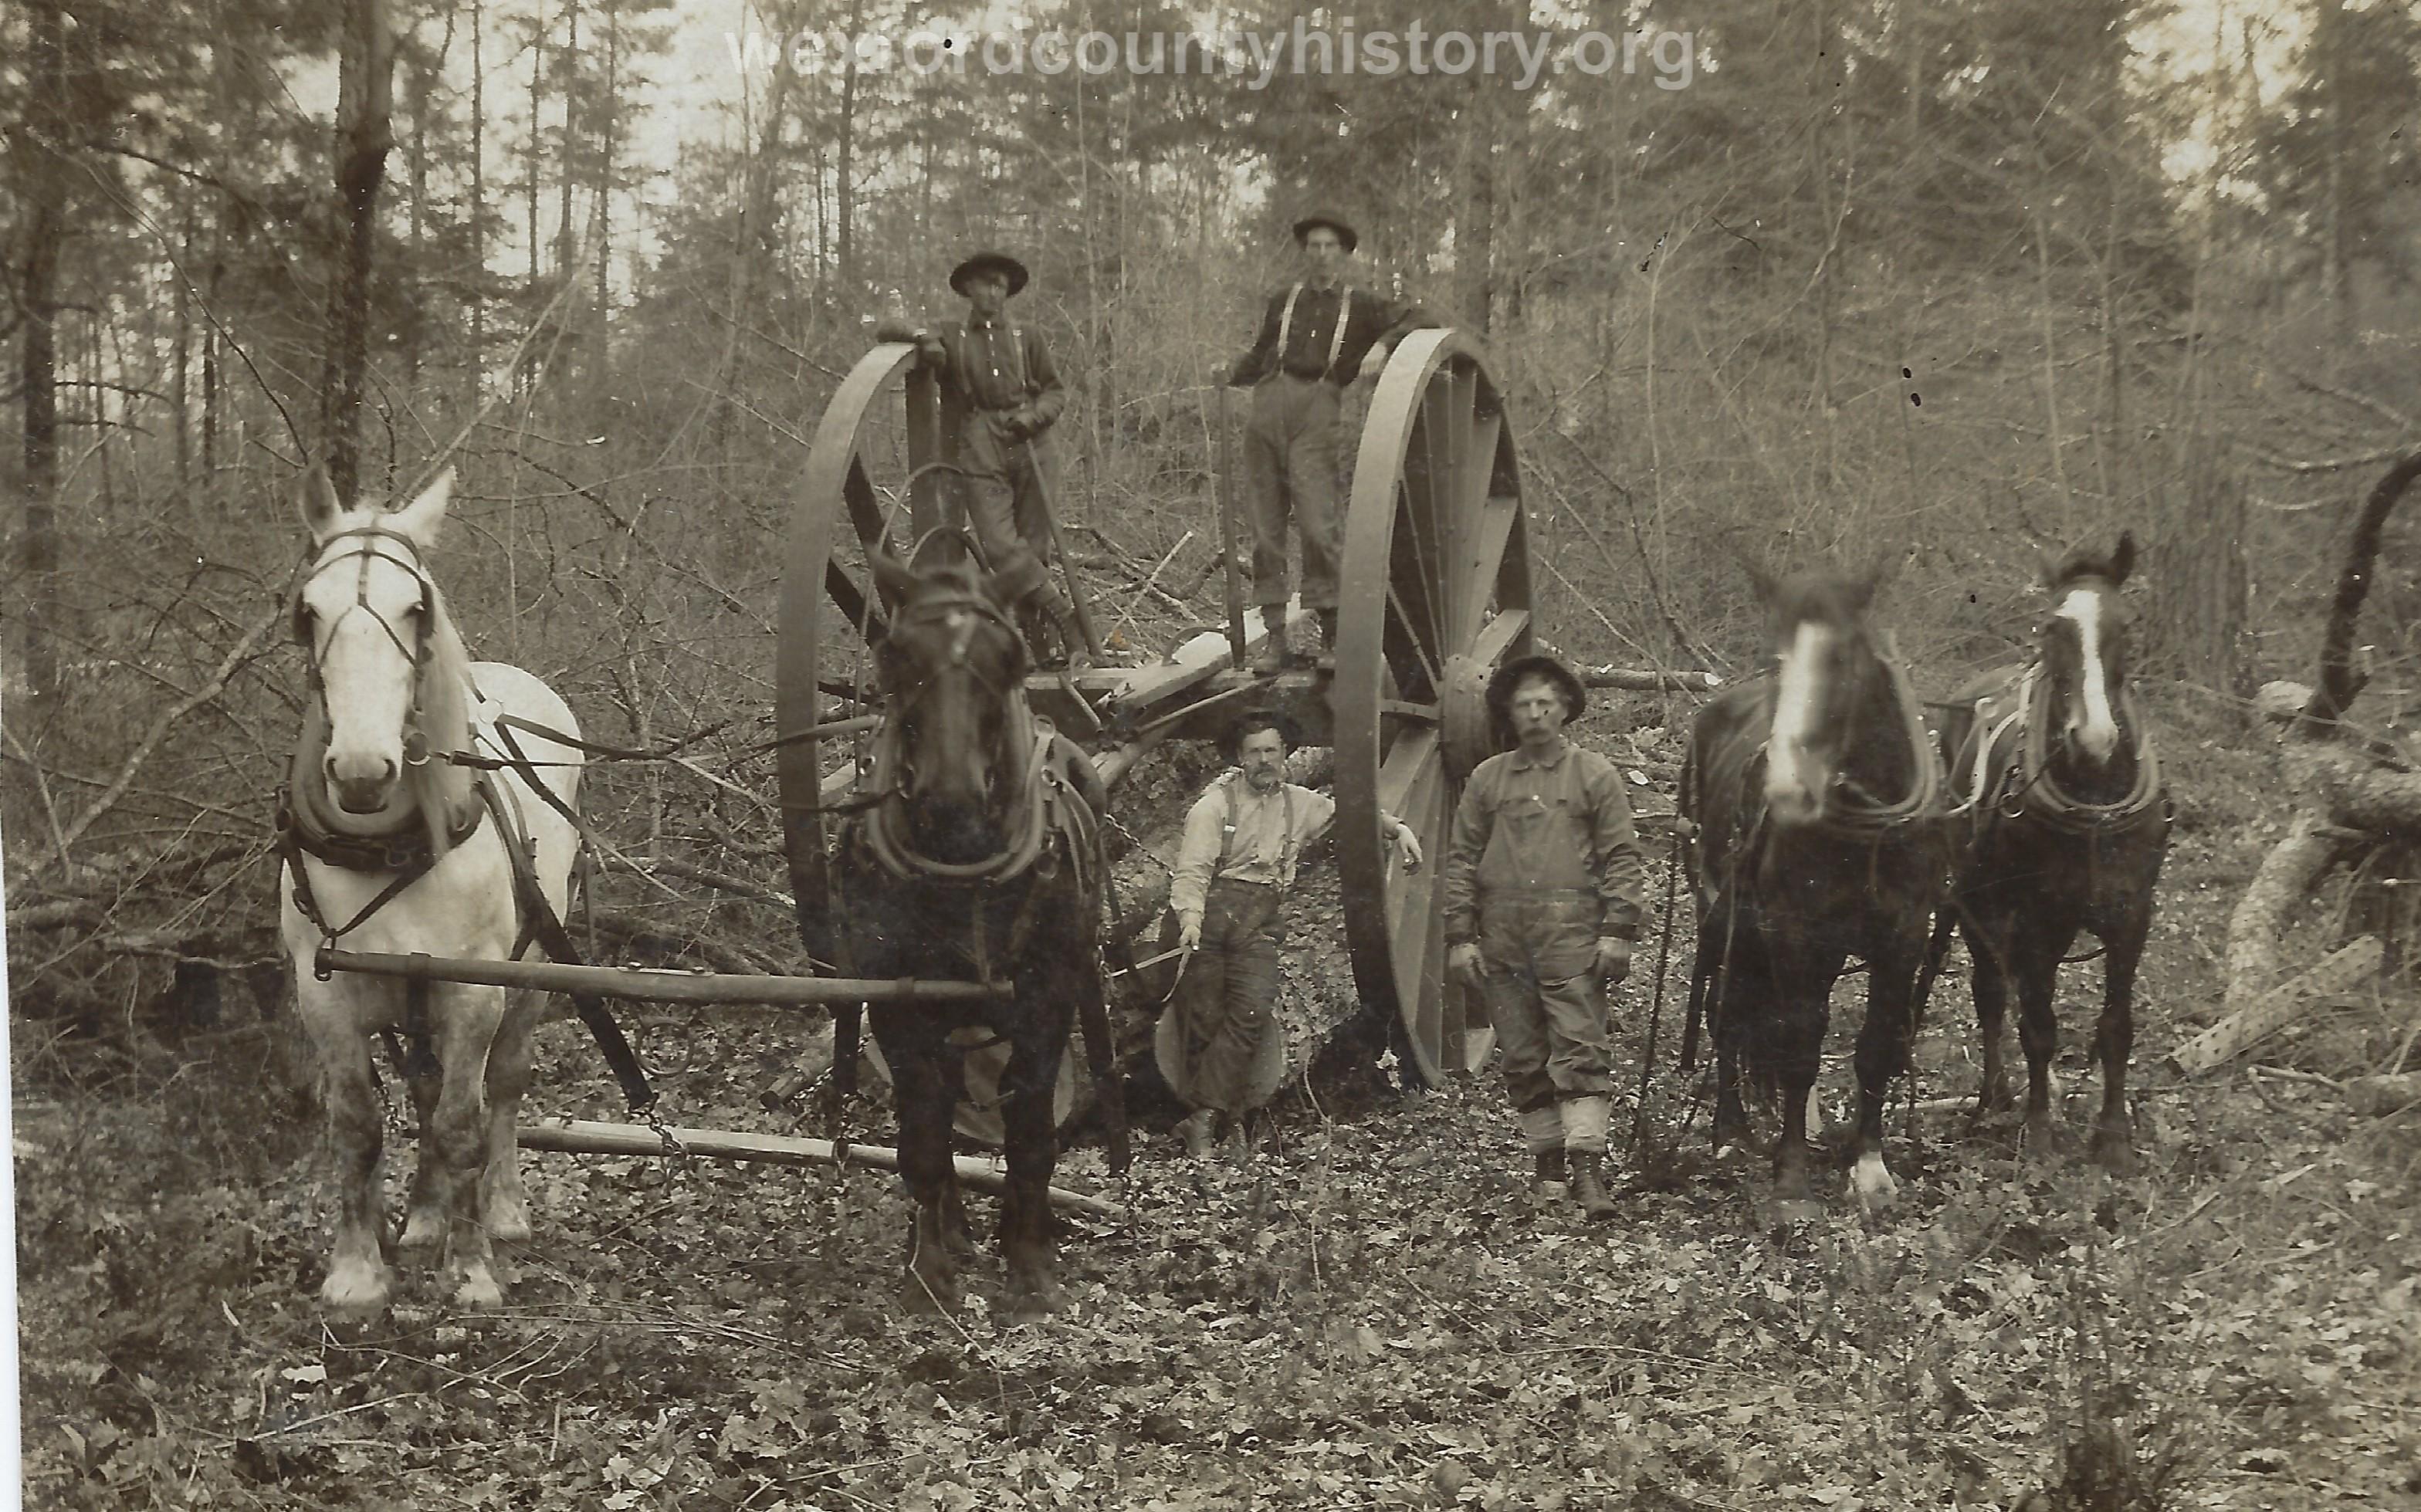 Cadillac-Lumber-Lumberjacks-With-Michigan-Wheels-And-Two-Two-Horse-Teams